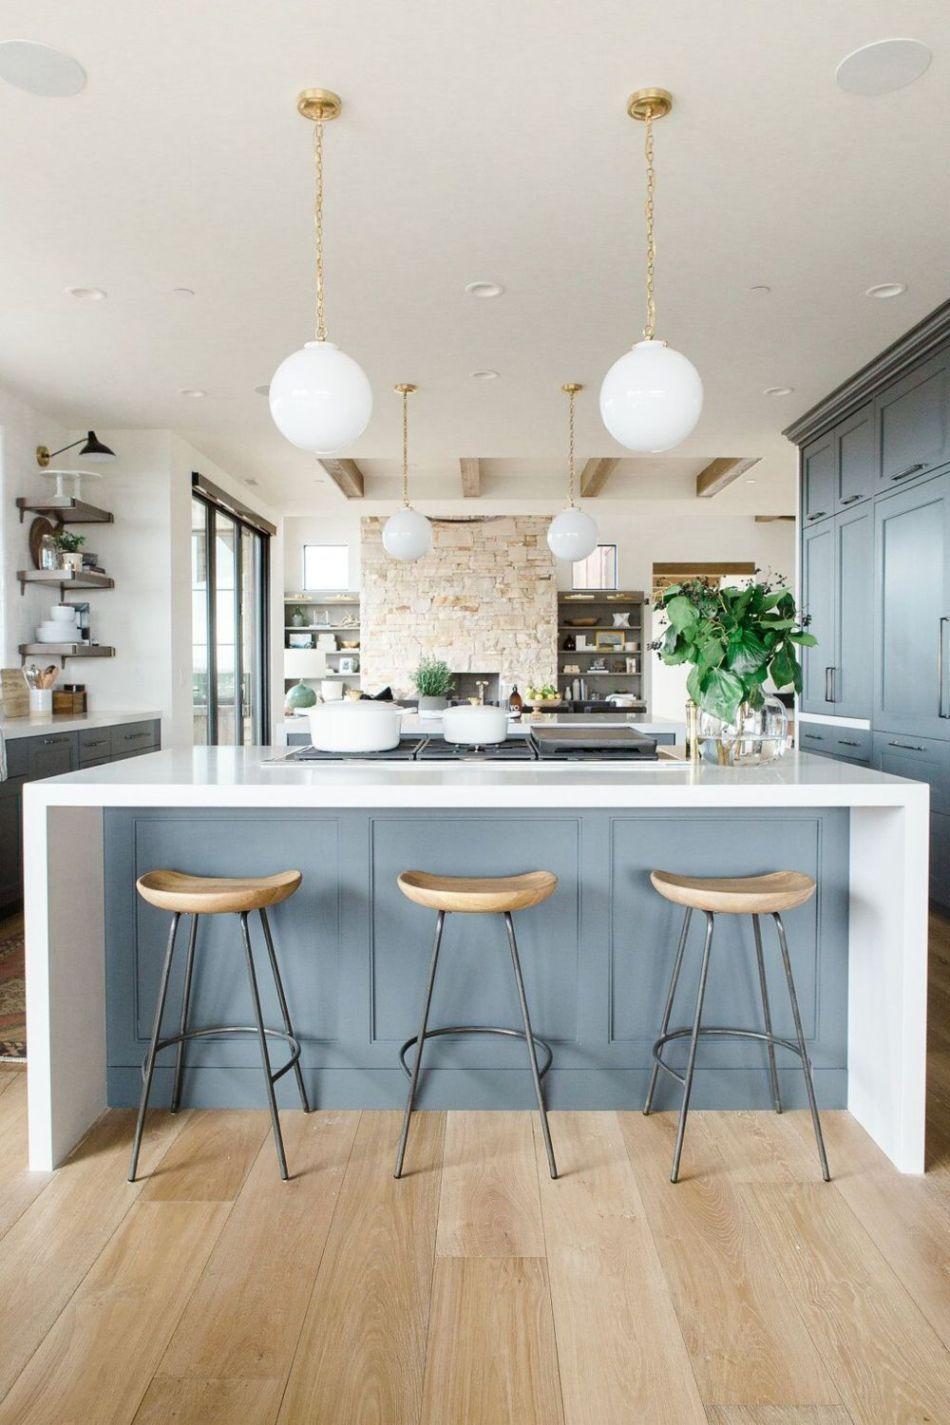 39 Eye Catching Modern Kitchen with Open Shelves | Open shelves ...